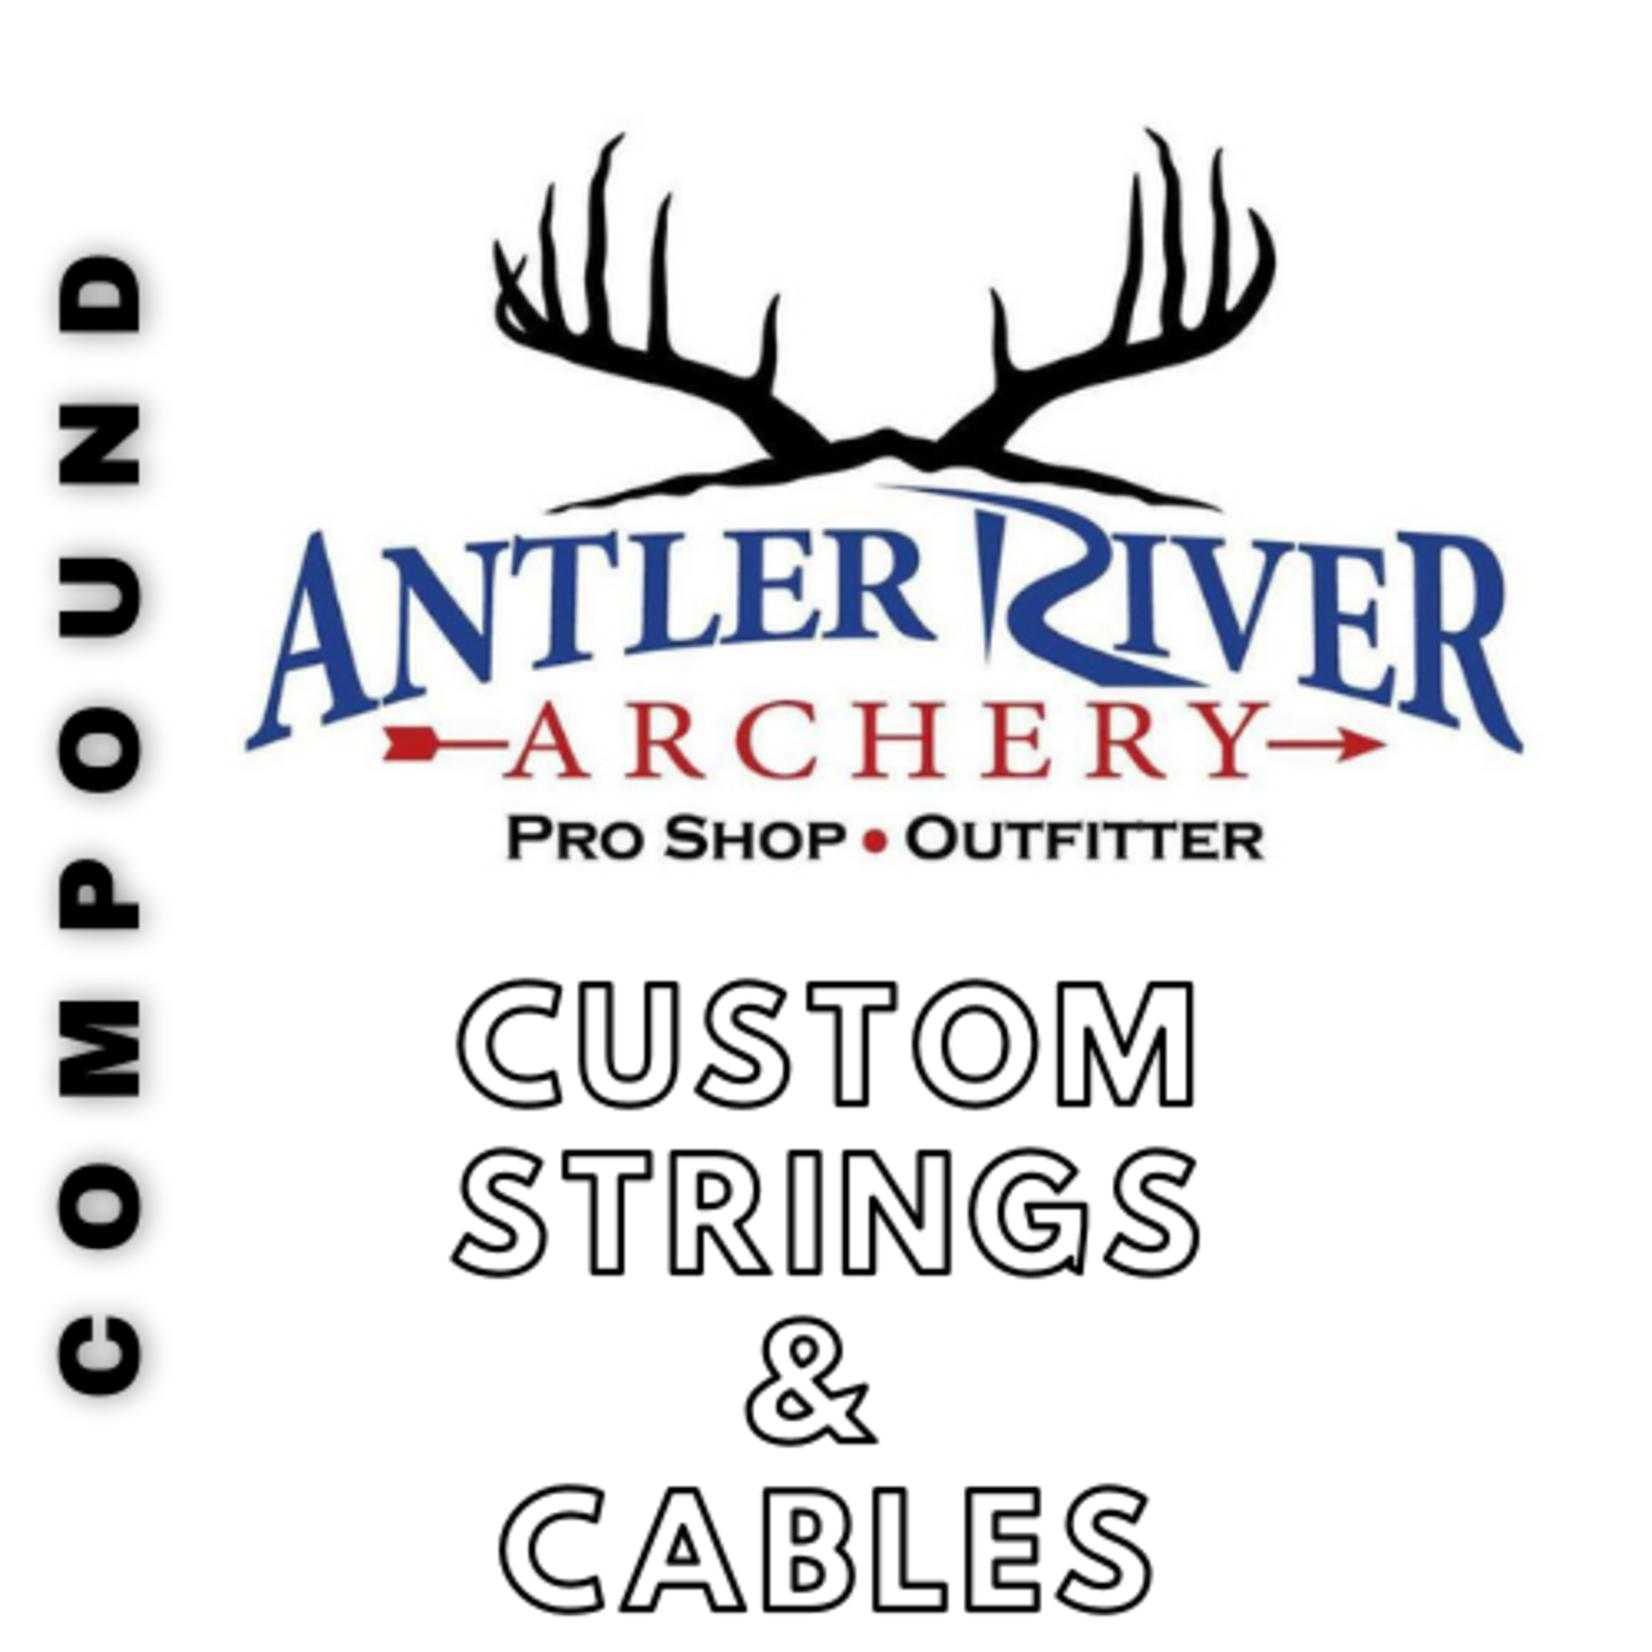 ARA Compound String Cable 1 Colour